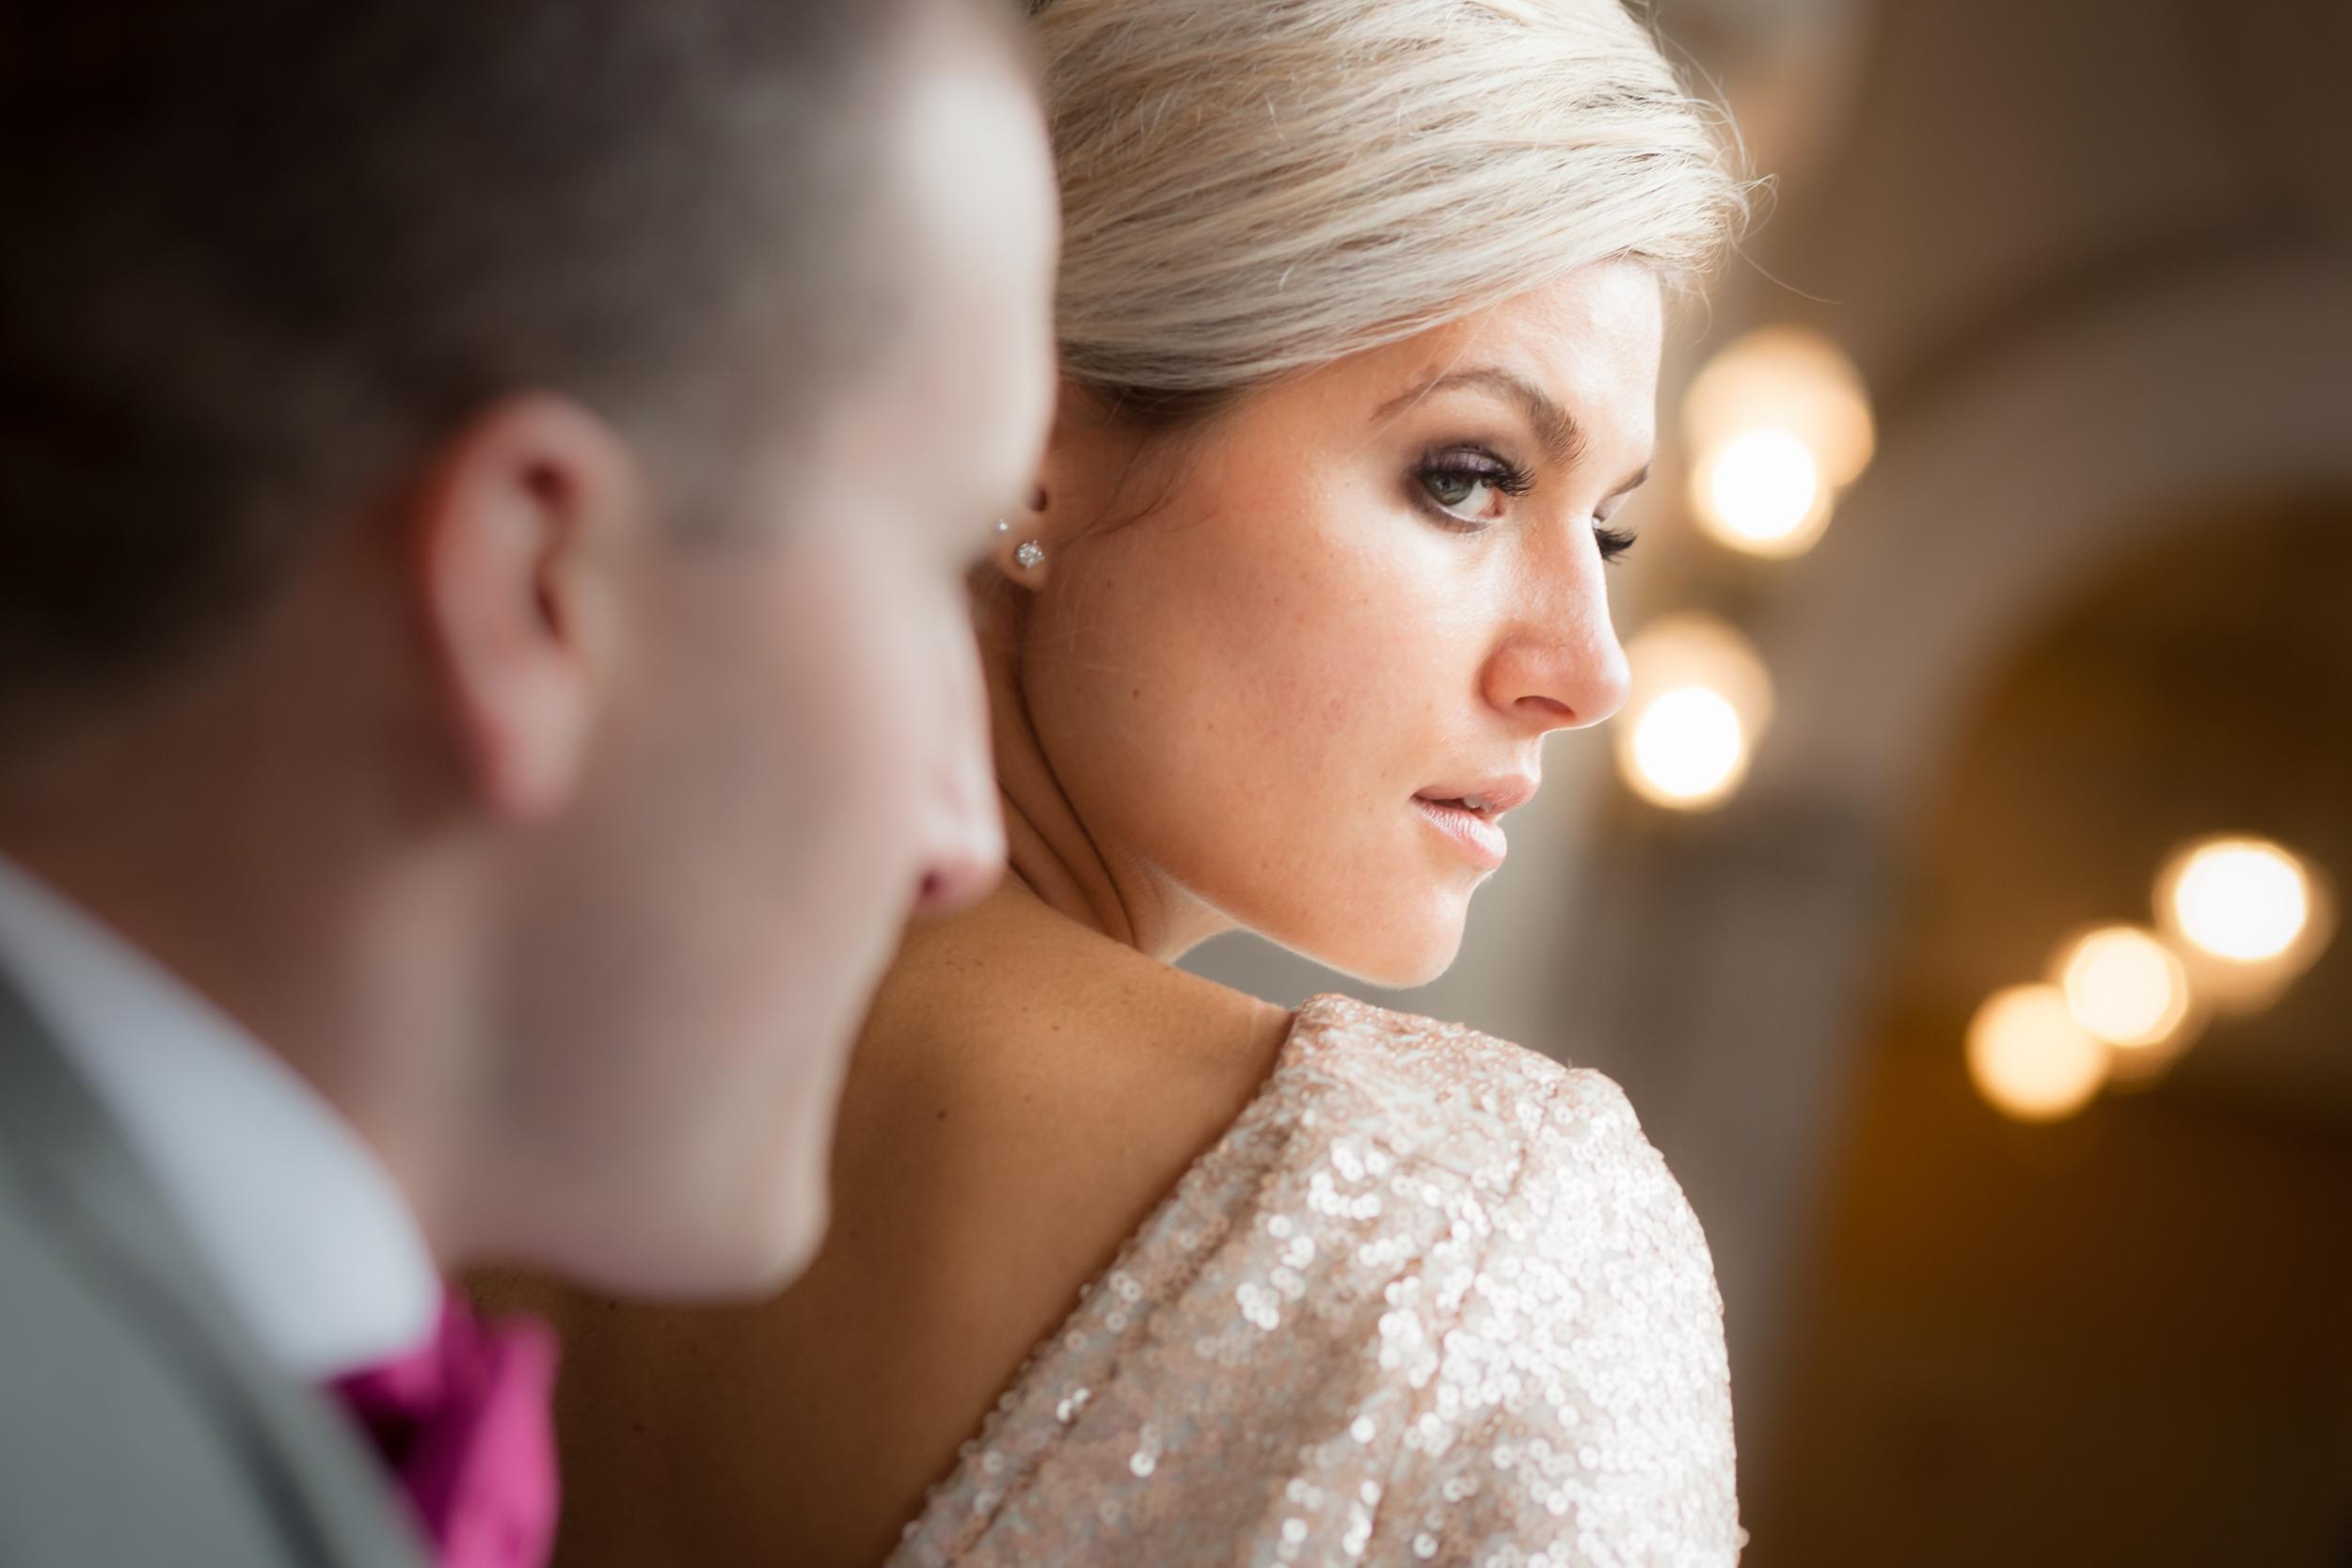 Fort_Point_Couple_photoshoot-Wedding-AlexLopezPhotography-3.jpg